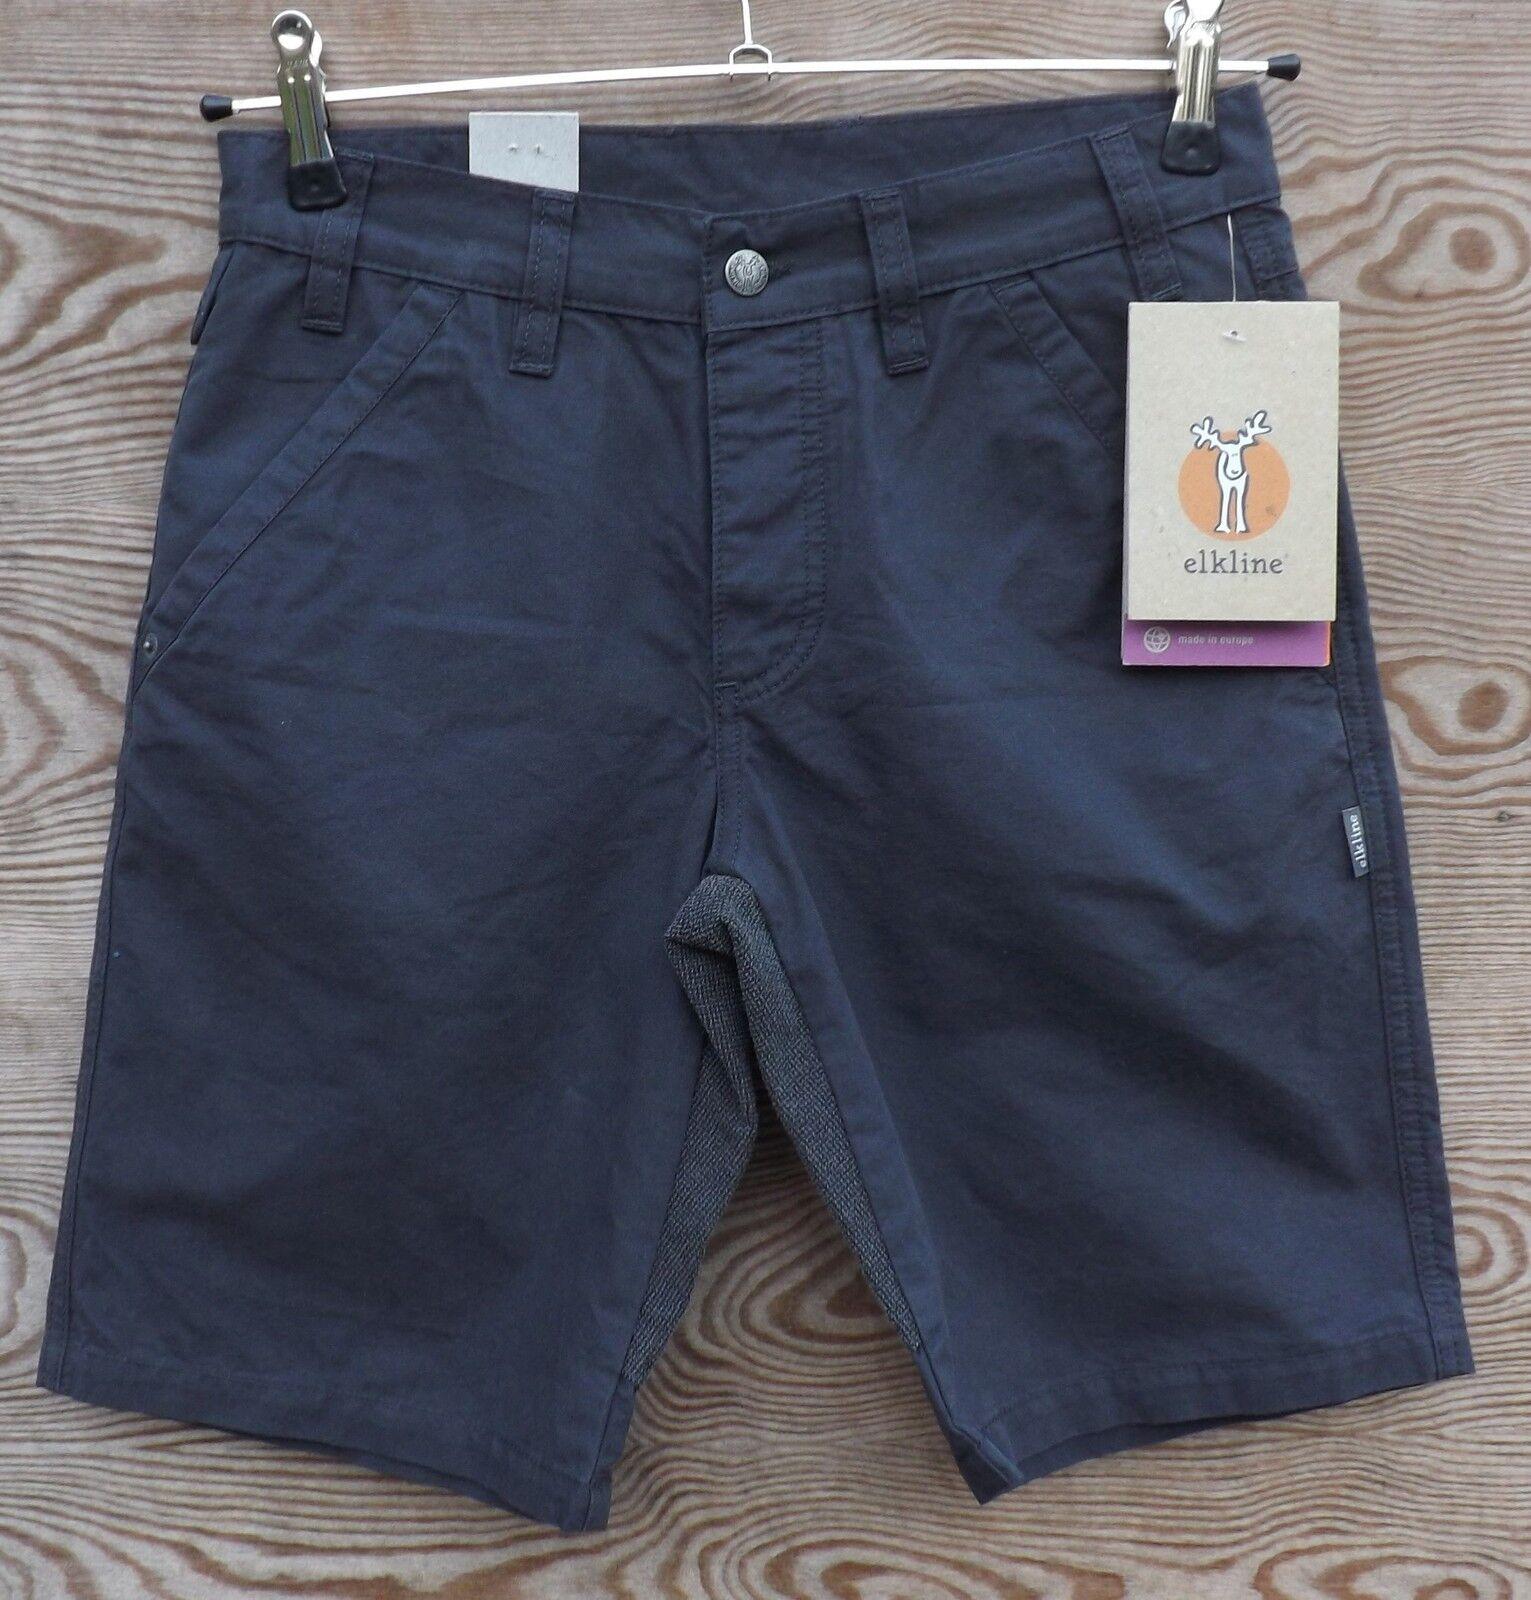 Elkline geht-was - shorts para Exterior con refuerzos hombre, antracita, size S